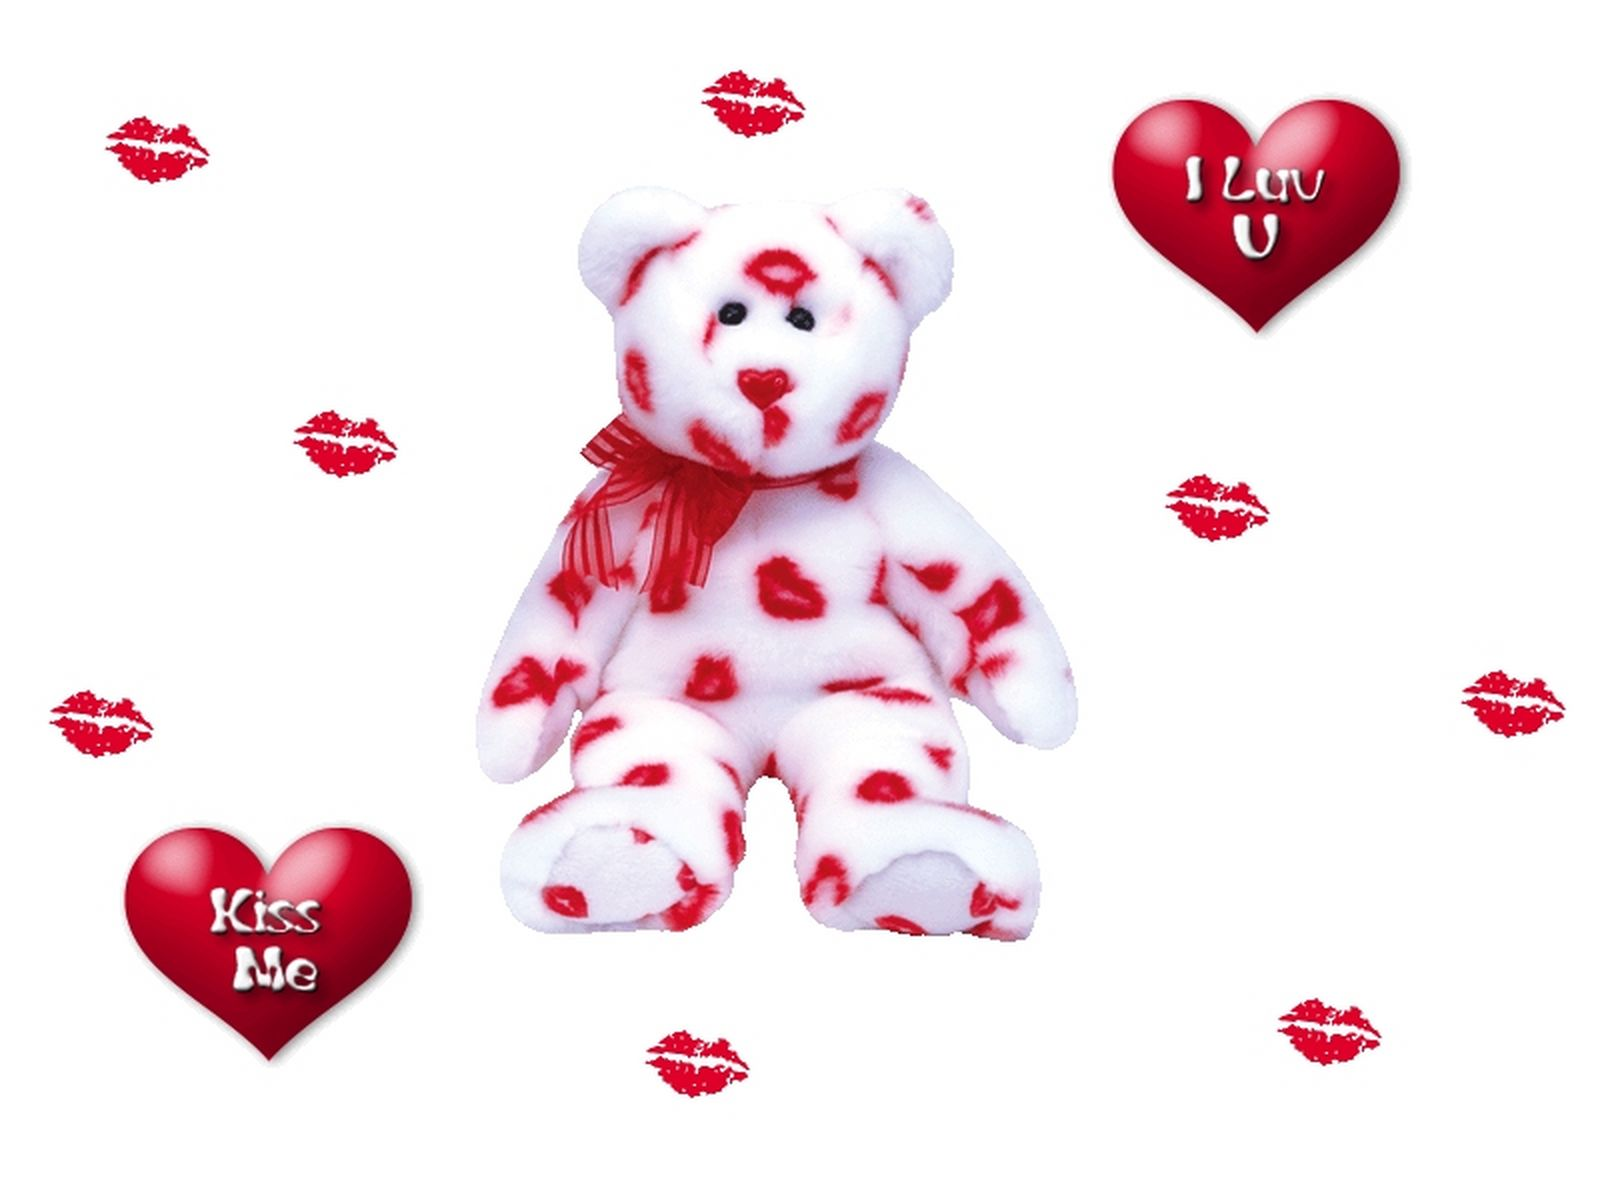 Cute Love Wallpapers 14 Desktop Wallpaper   Hivewallpapercom 1600x1200